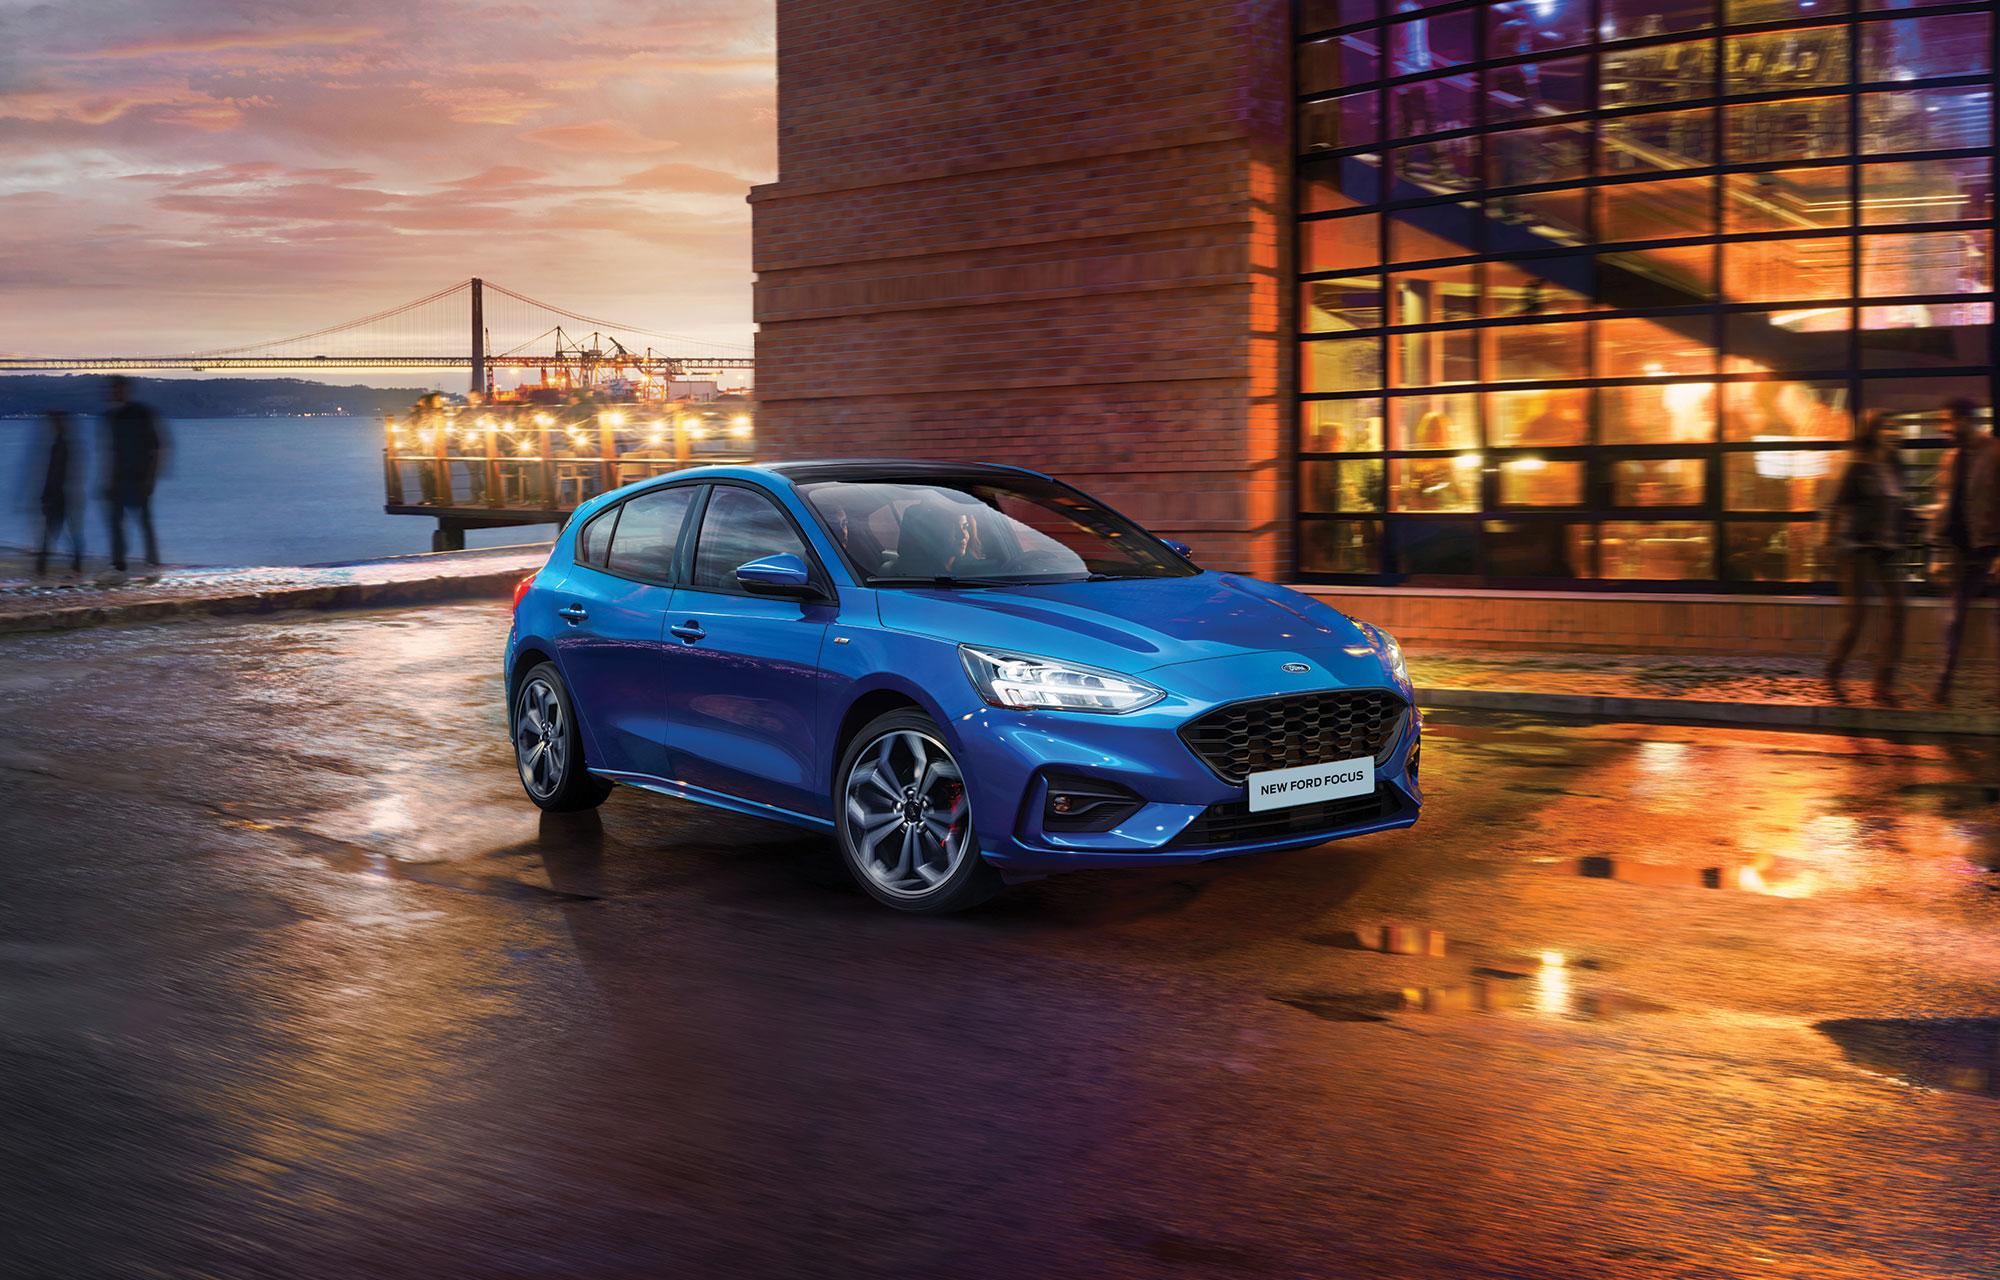 Open doors, erleben Sie den neuen Ford Focus